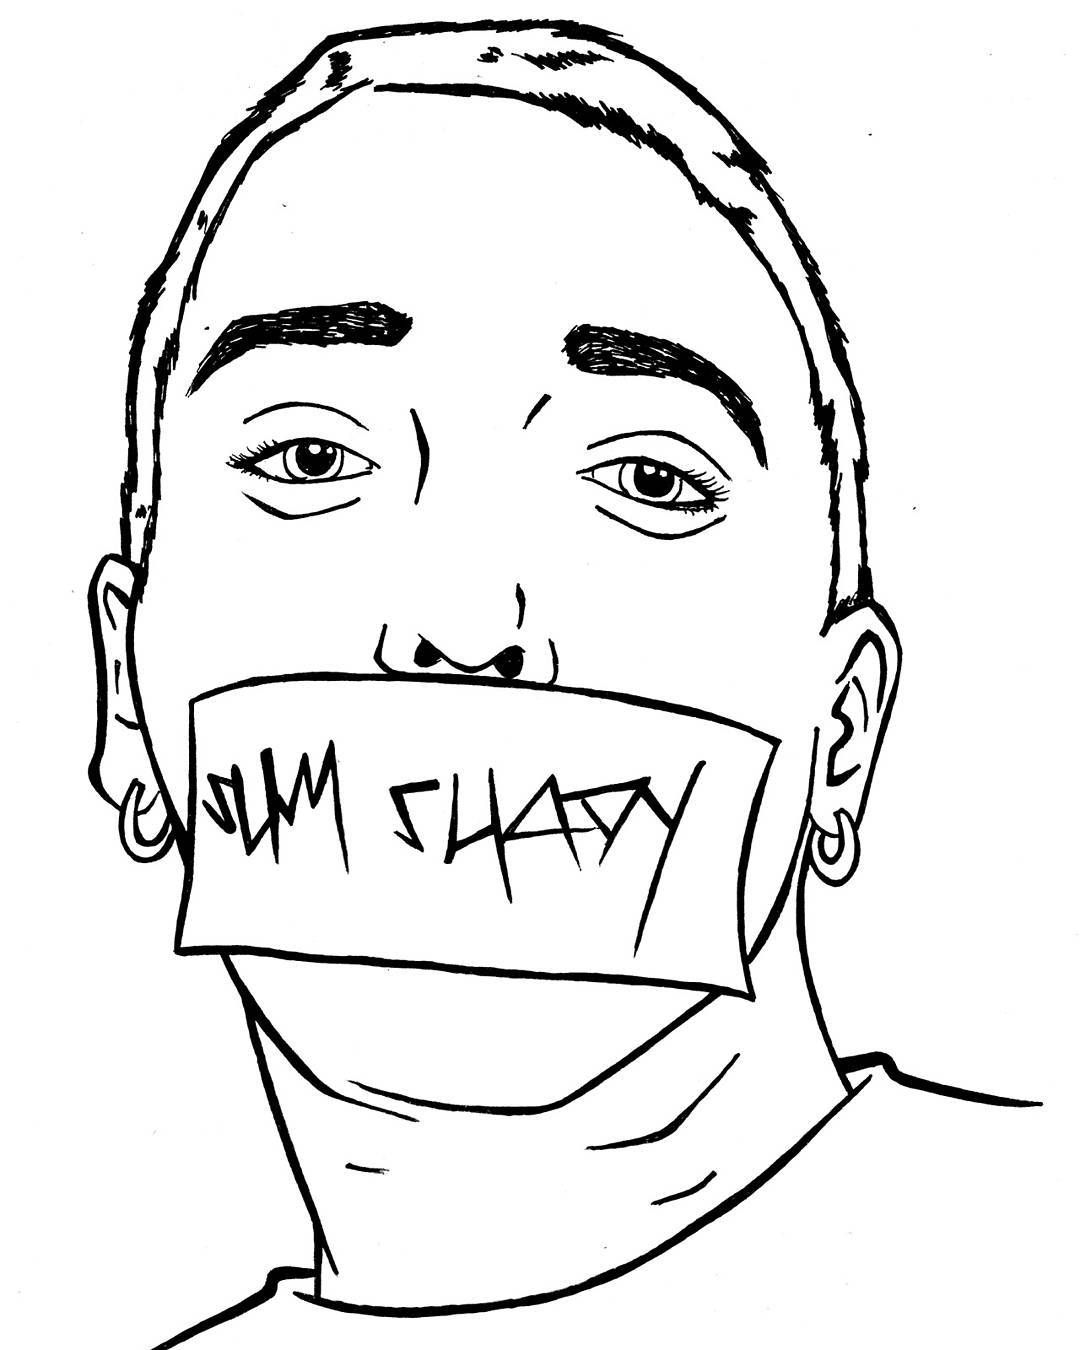 lil pump coloring pages | #eminem #slimshady #art #linedrawing #rapper # ...